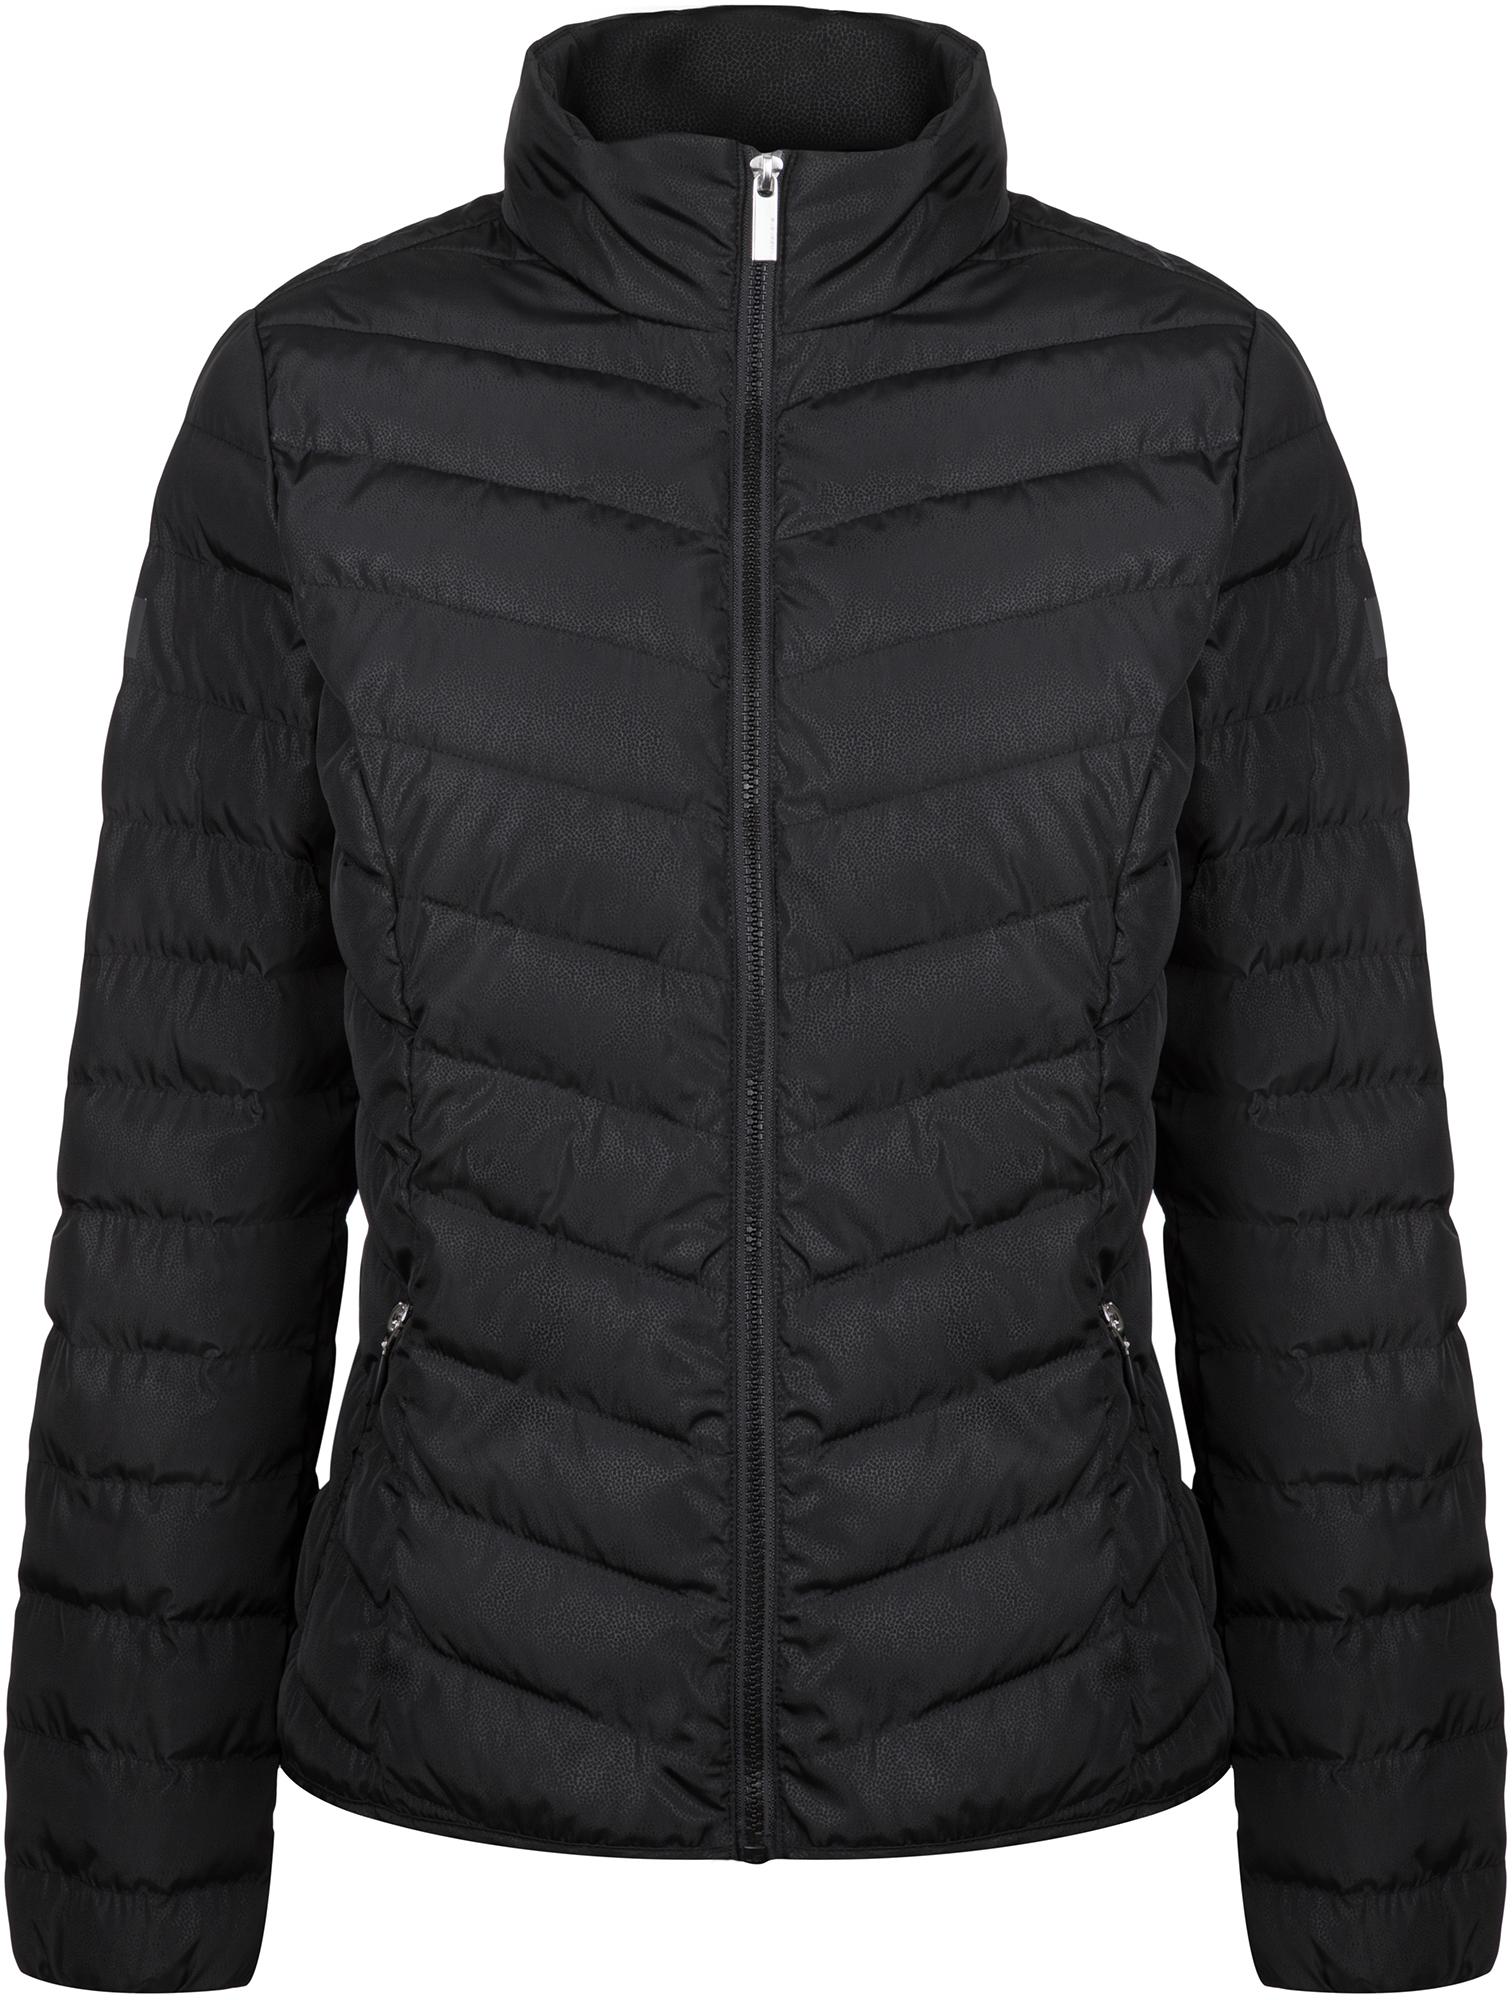 IcePeak Куртка утепленная женская IcePeak Vacha, размер 46 цена 2017